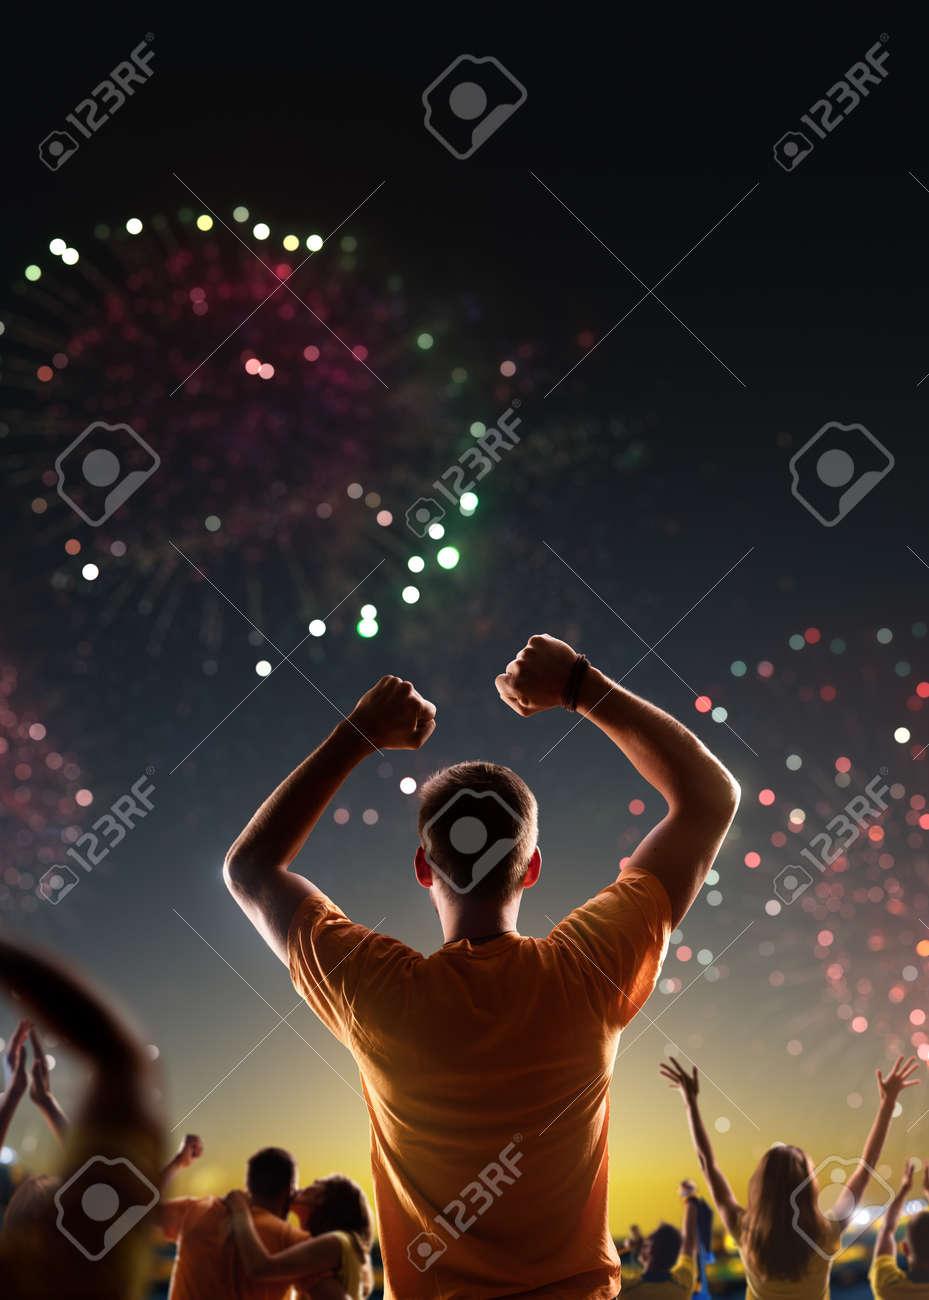 Fans celebrate in Stadium Arena night fireworks - 158199233